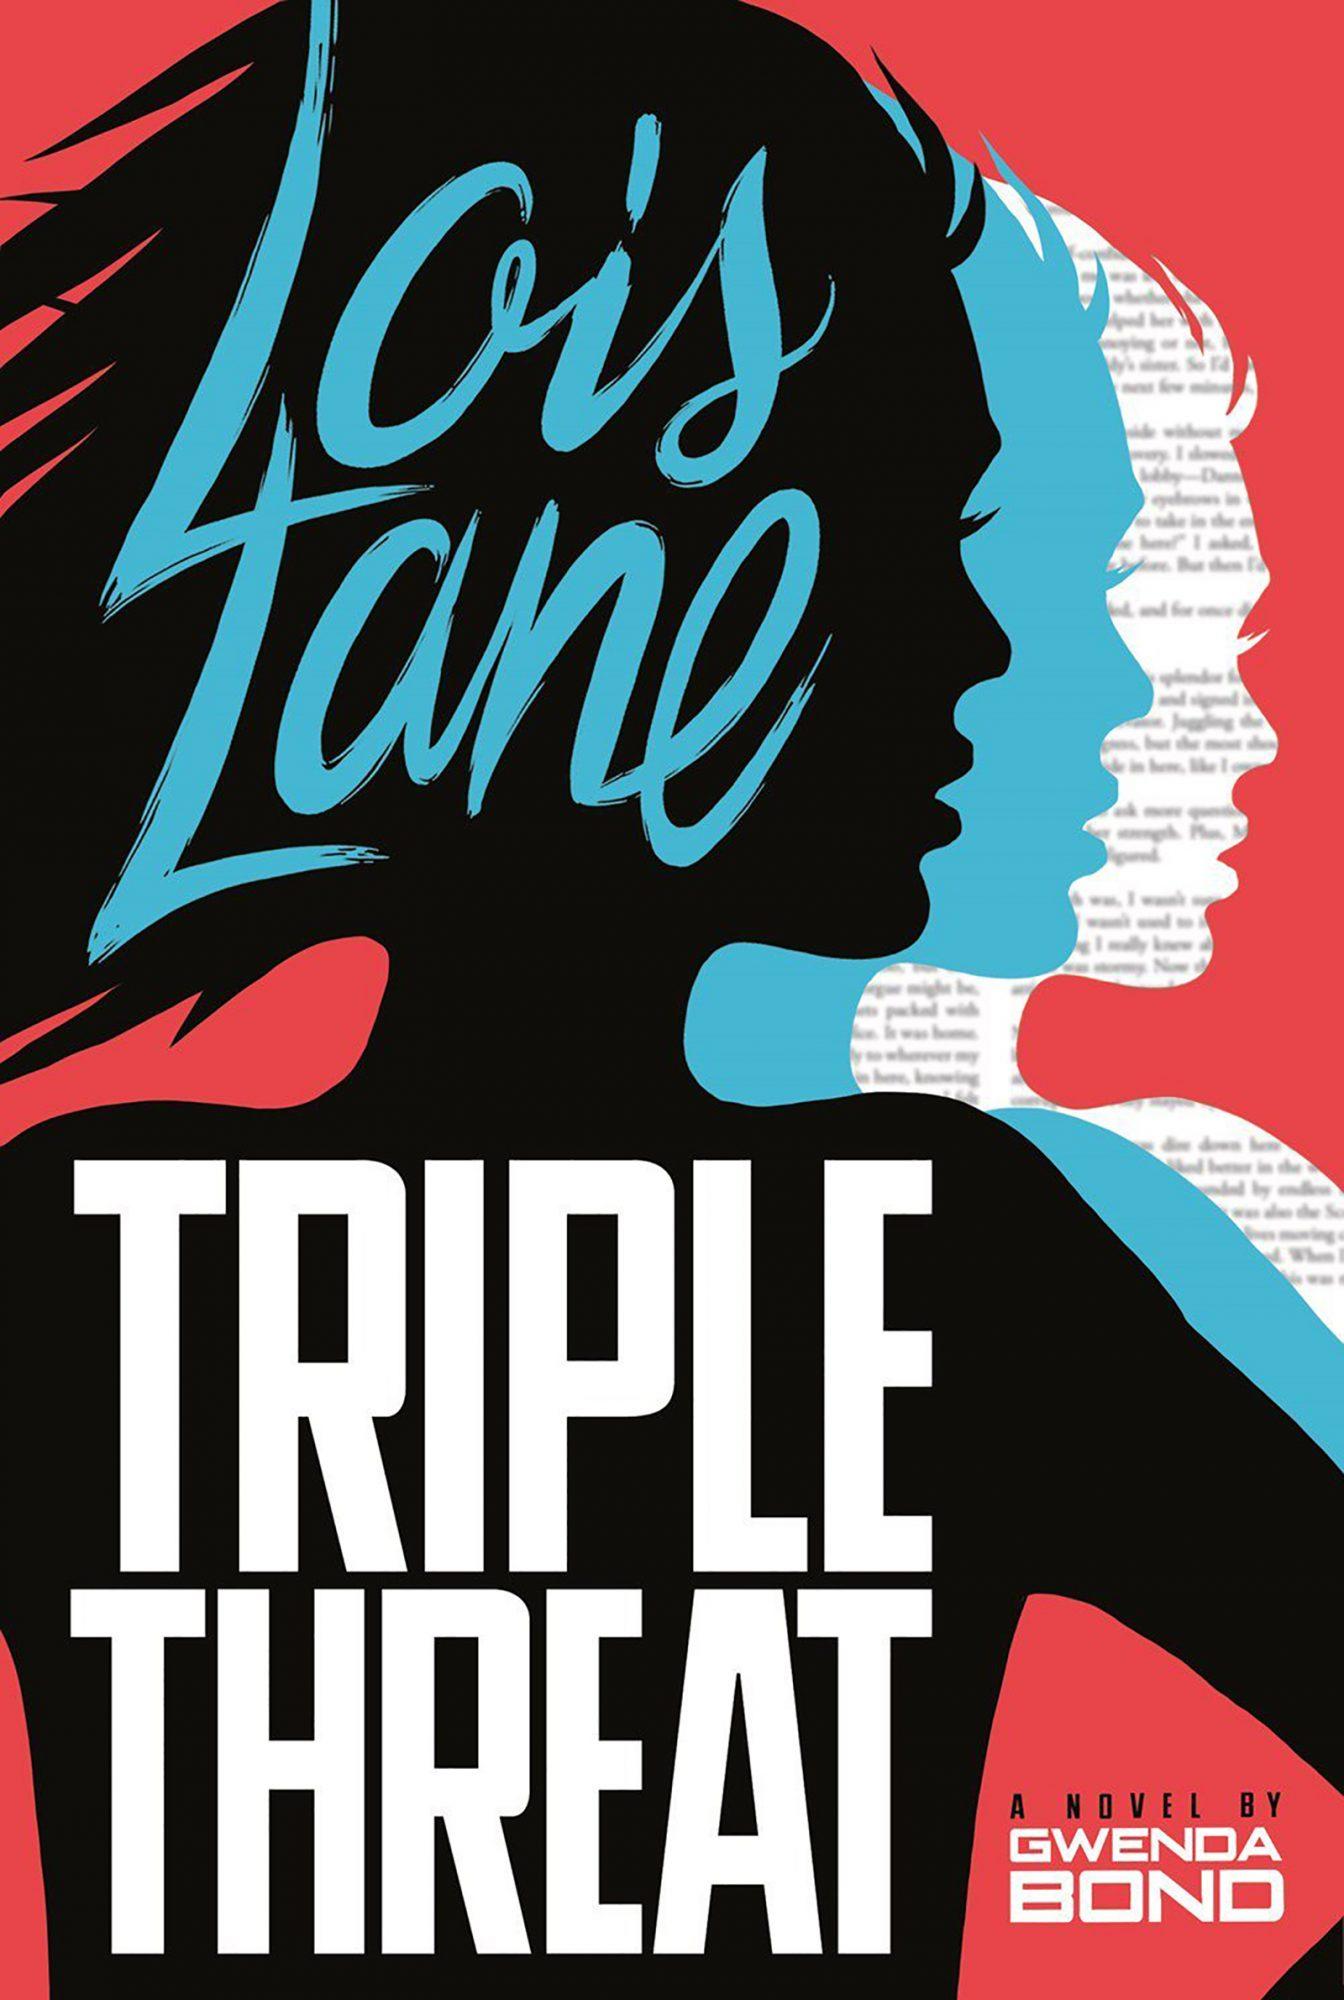 lois-lane-triple-threat-cover